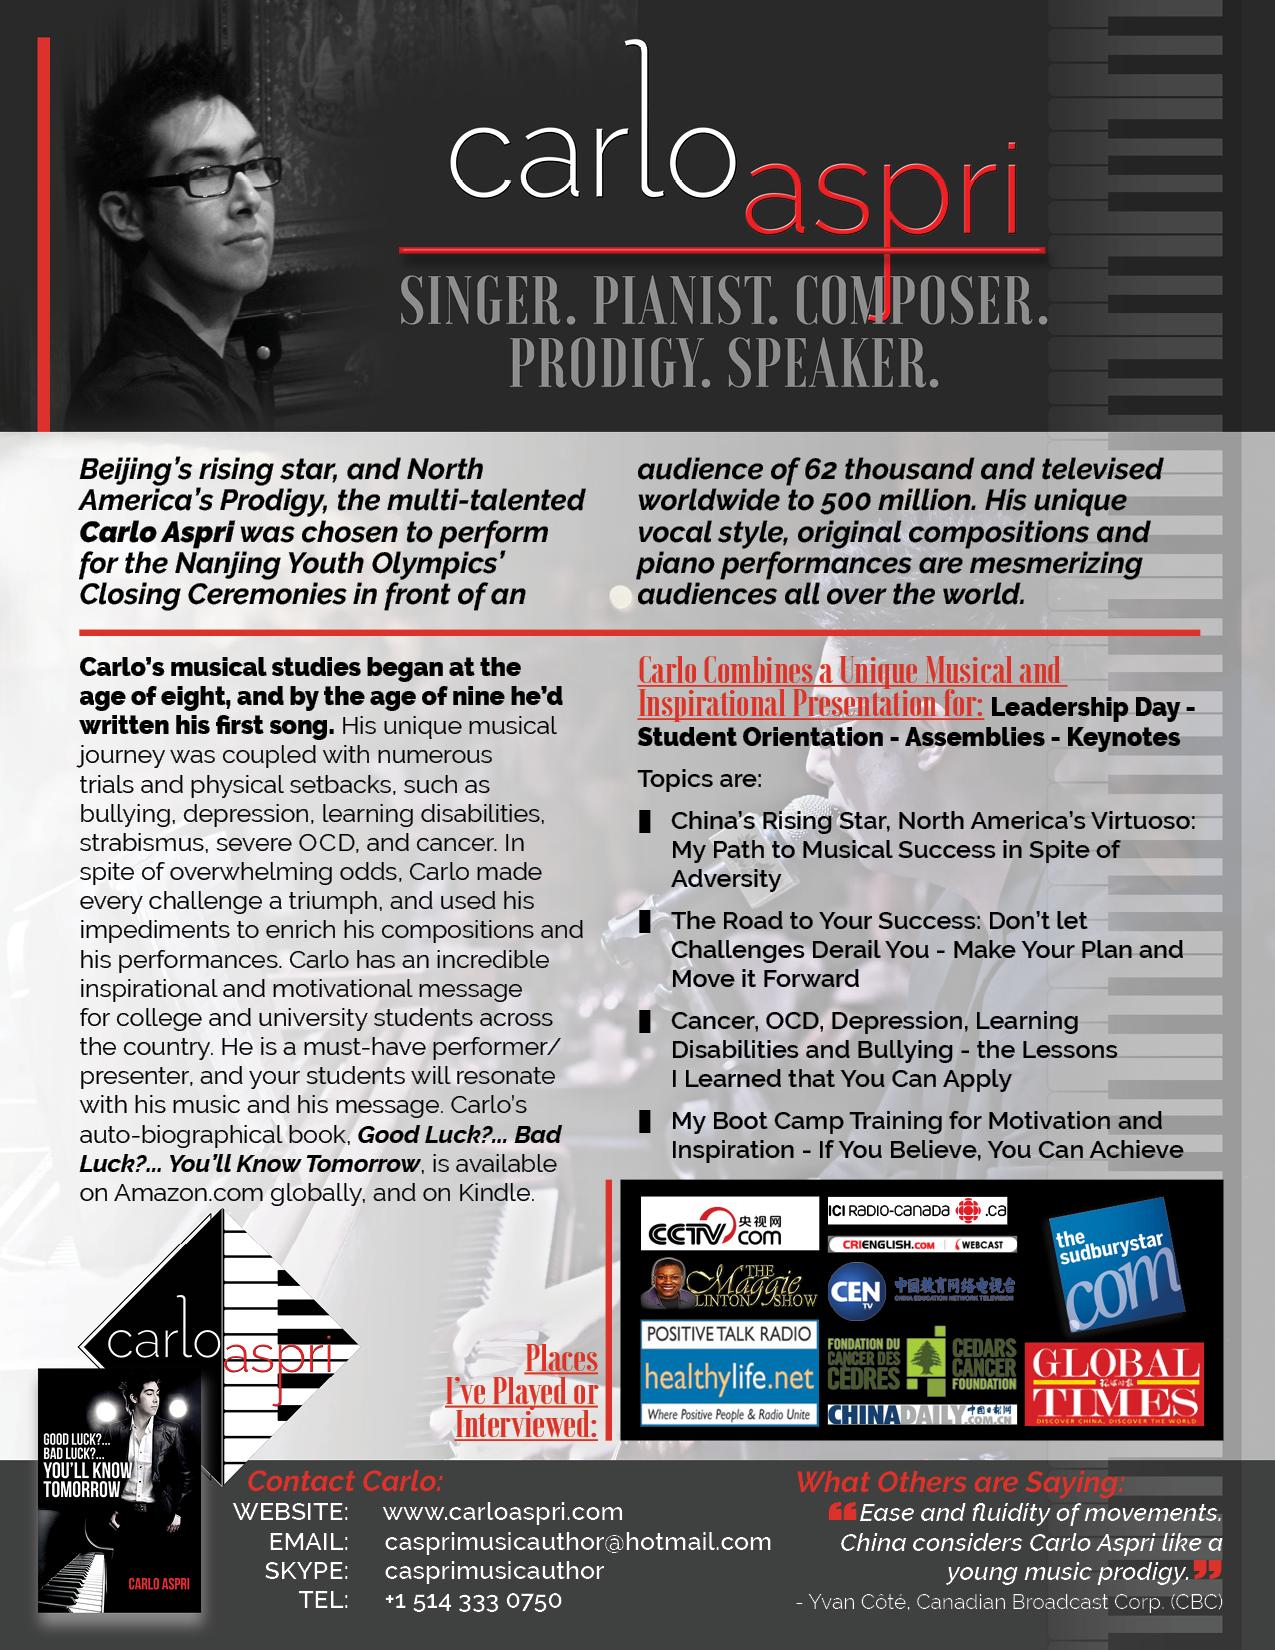 Carlo Aspri - Speaker - Singer - Pianist - Composer - Prodigy -